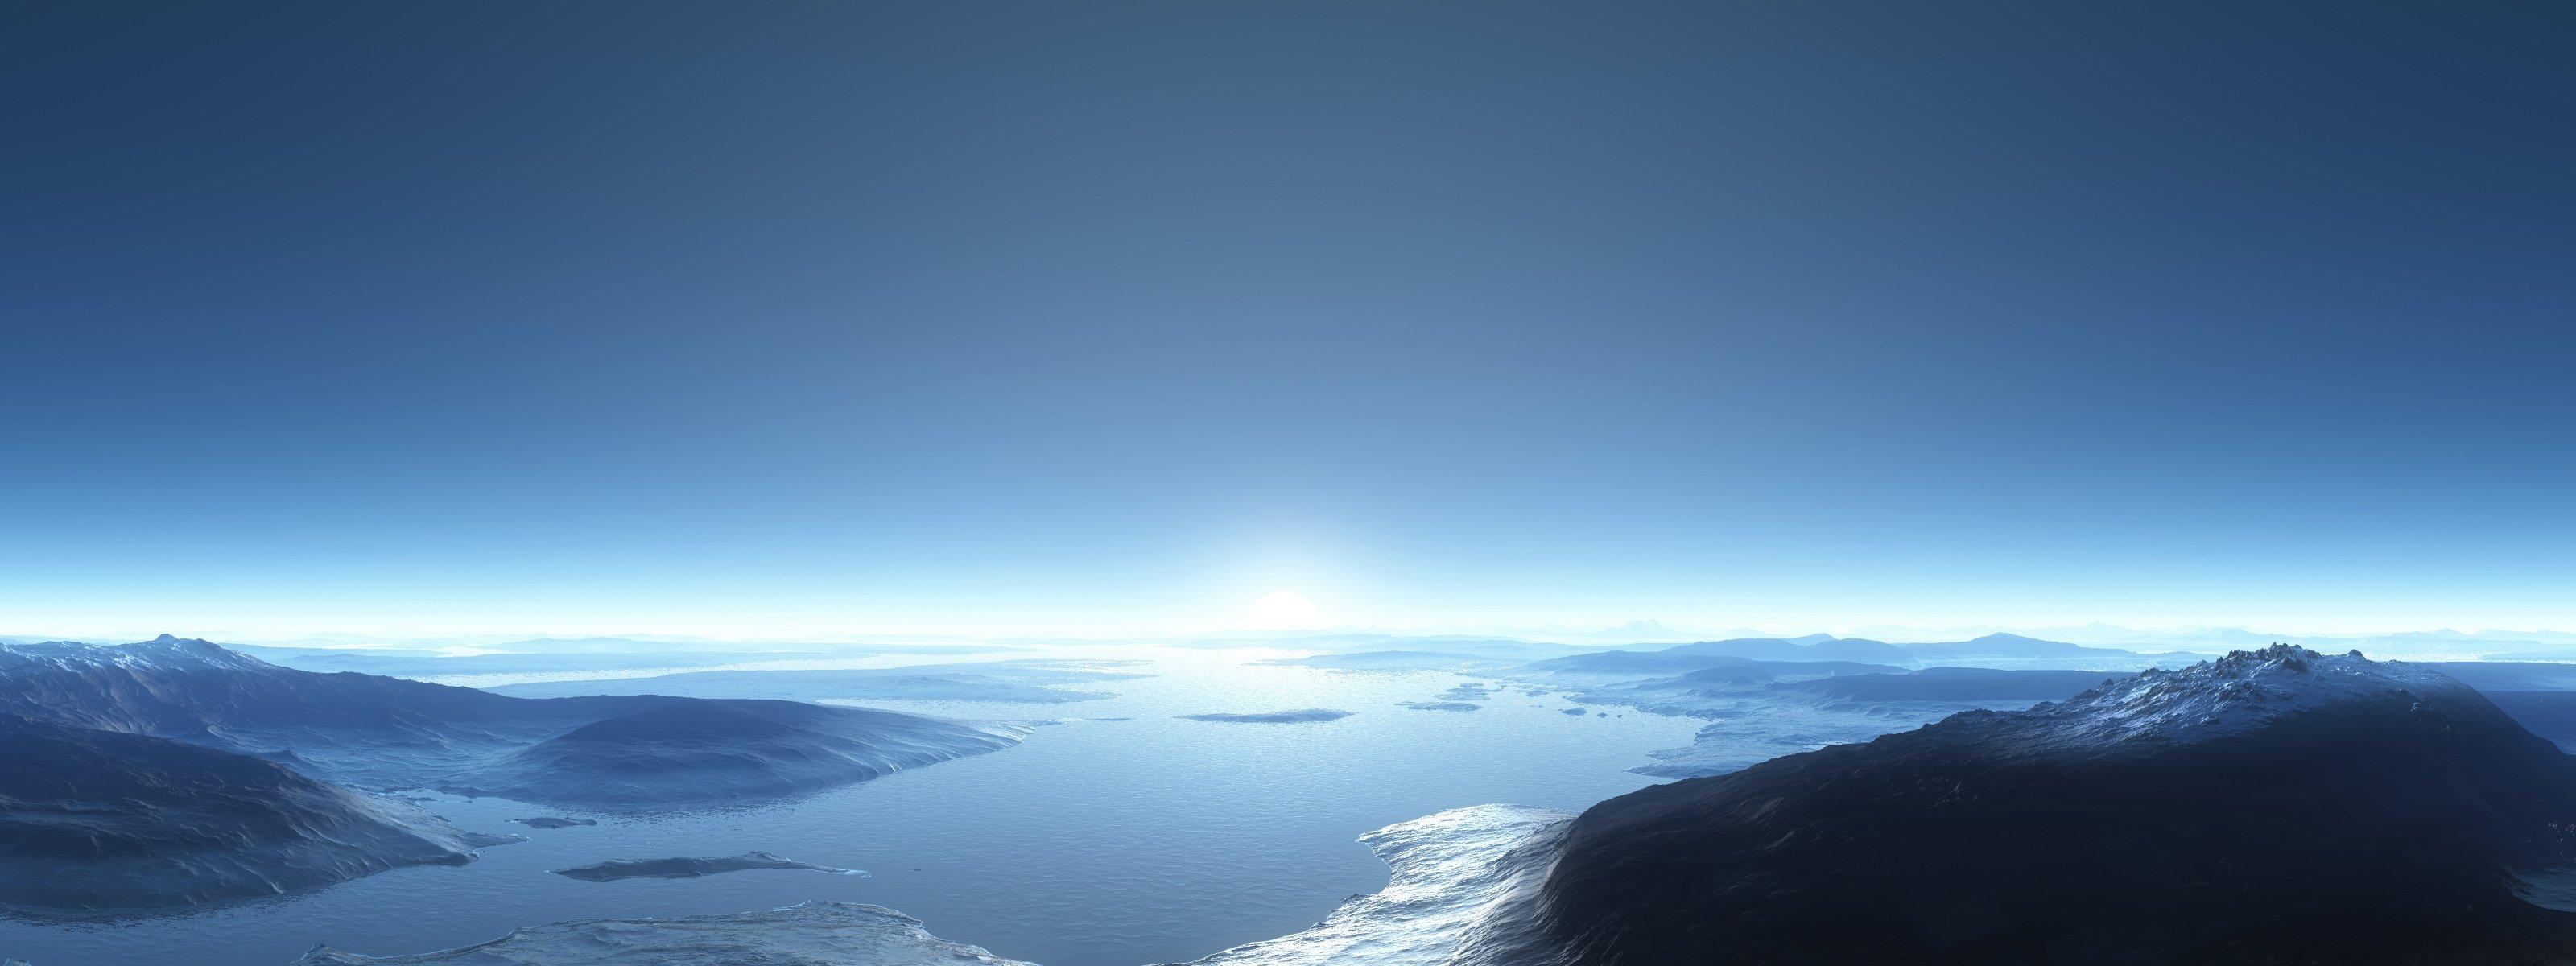 облака лучи горы вода бесплатно